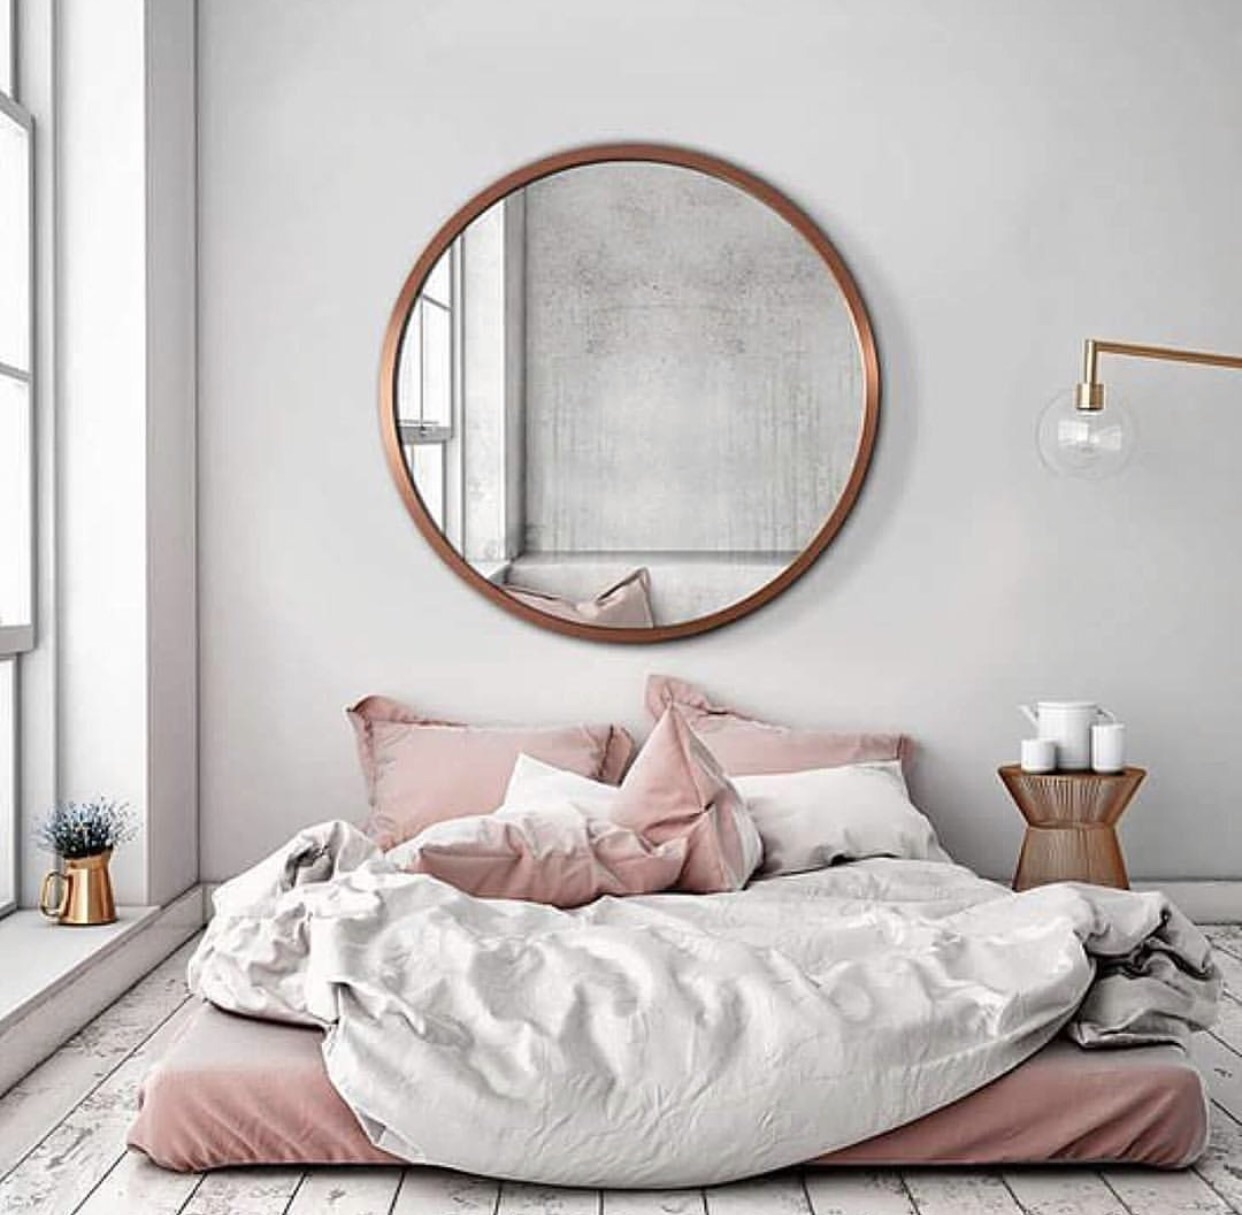 grand miroir rond decoration chambre